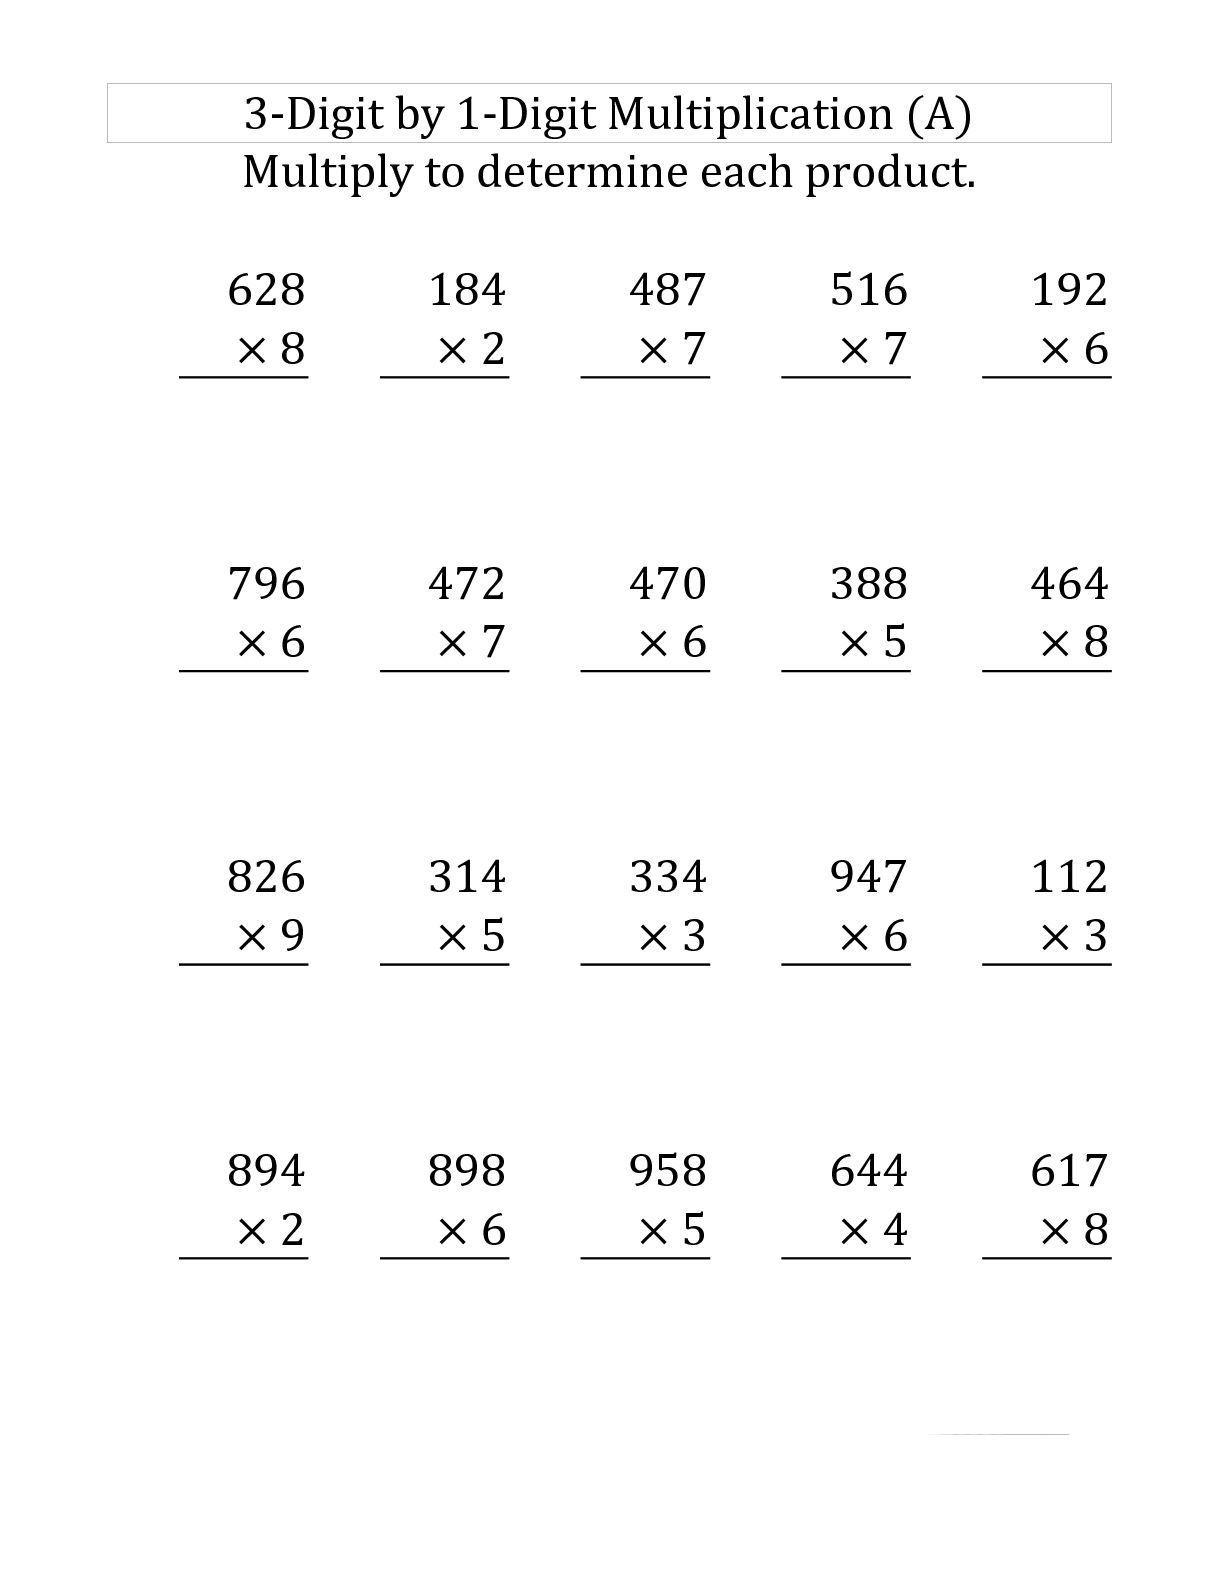 4th Grade Multiplication Worksheets - Best Coloring Pages For Kids   Multiplication  worksheets [ 1584 x 1224 Pixel ]